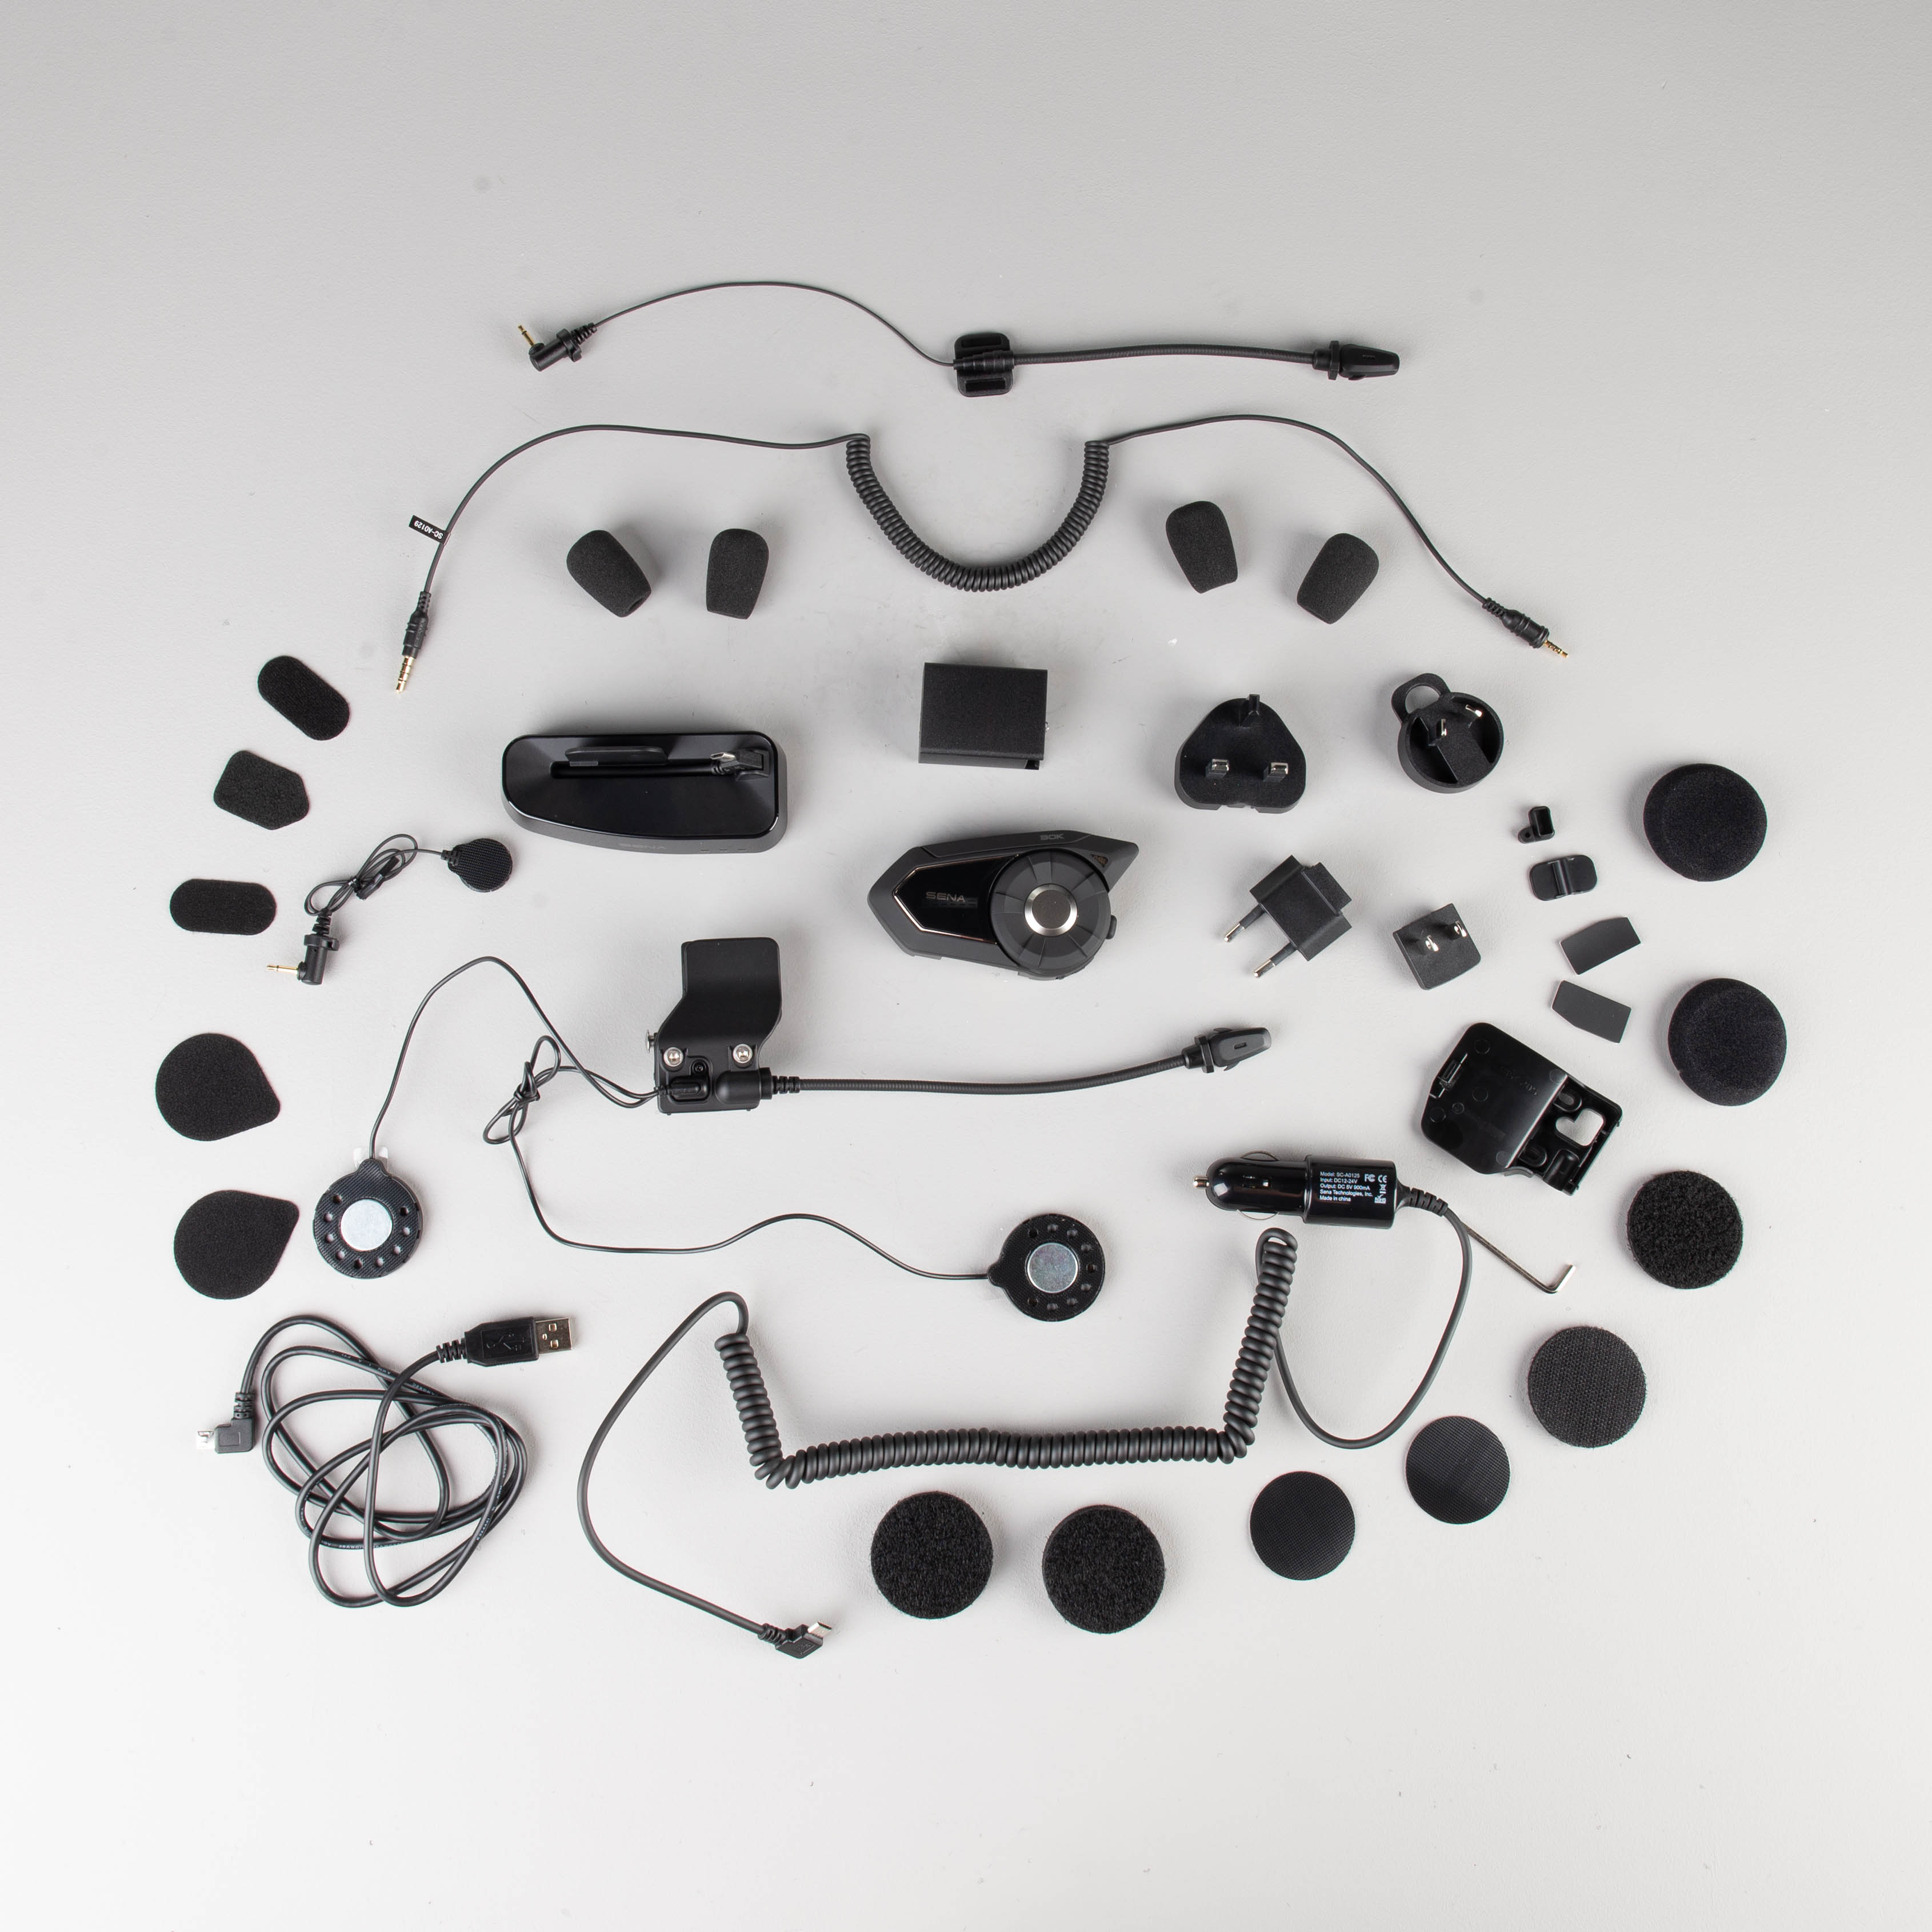 Sena 30K with Mesh Intercom WiFi Pack Communication System Helmet Accessories